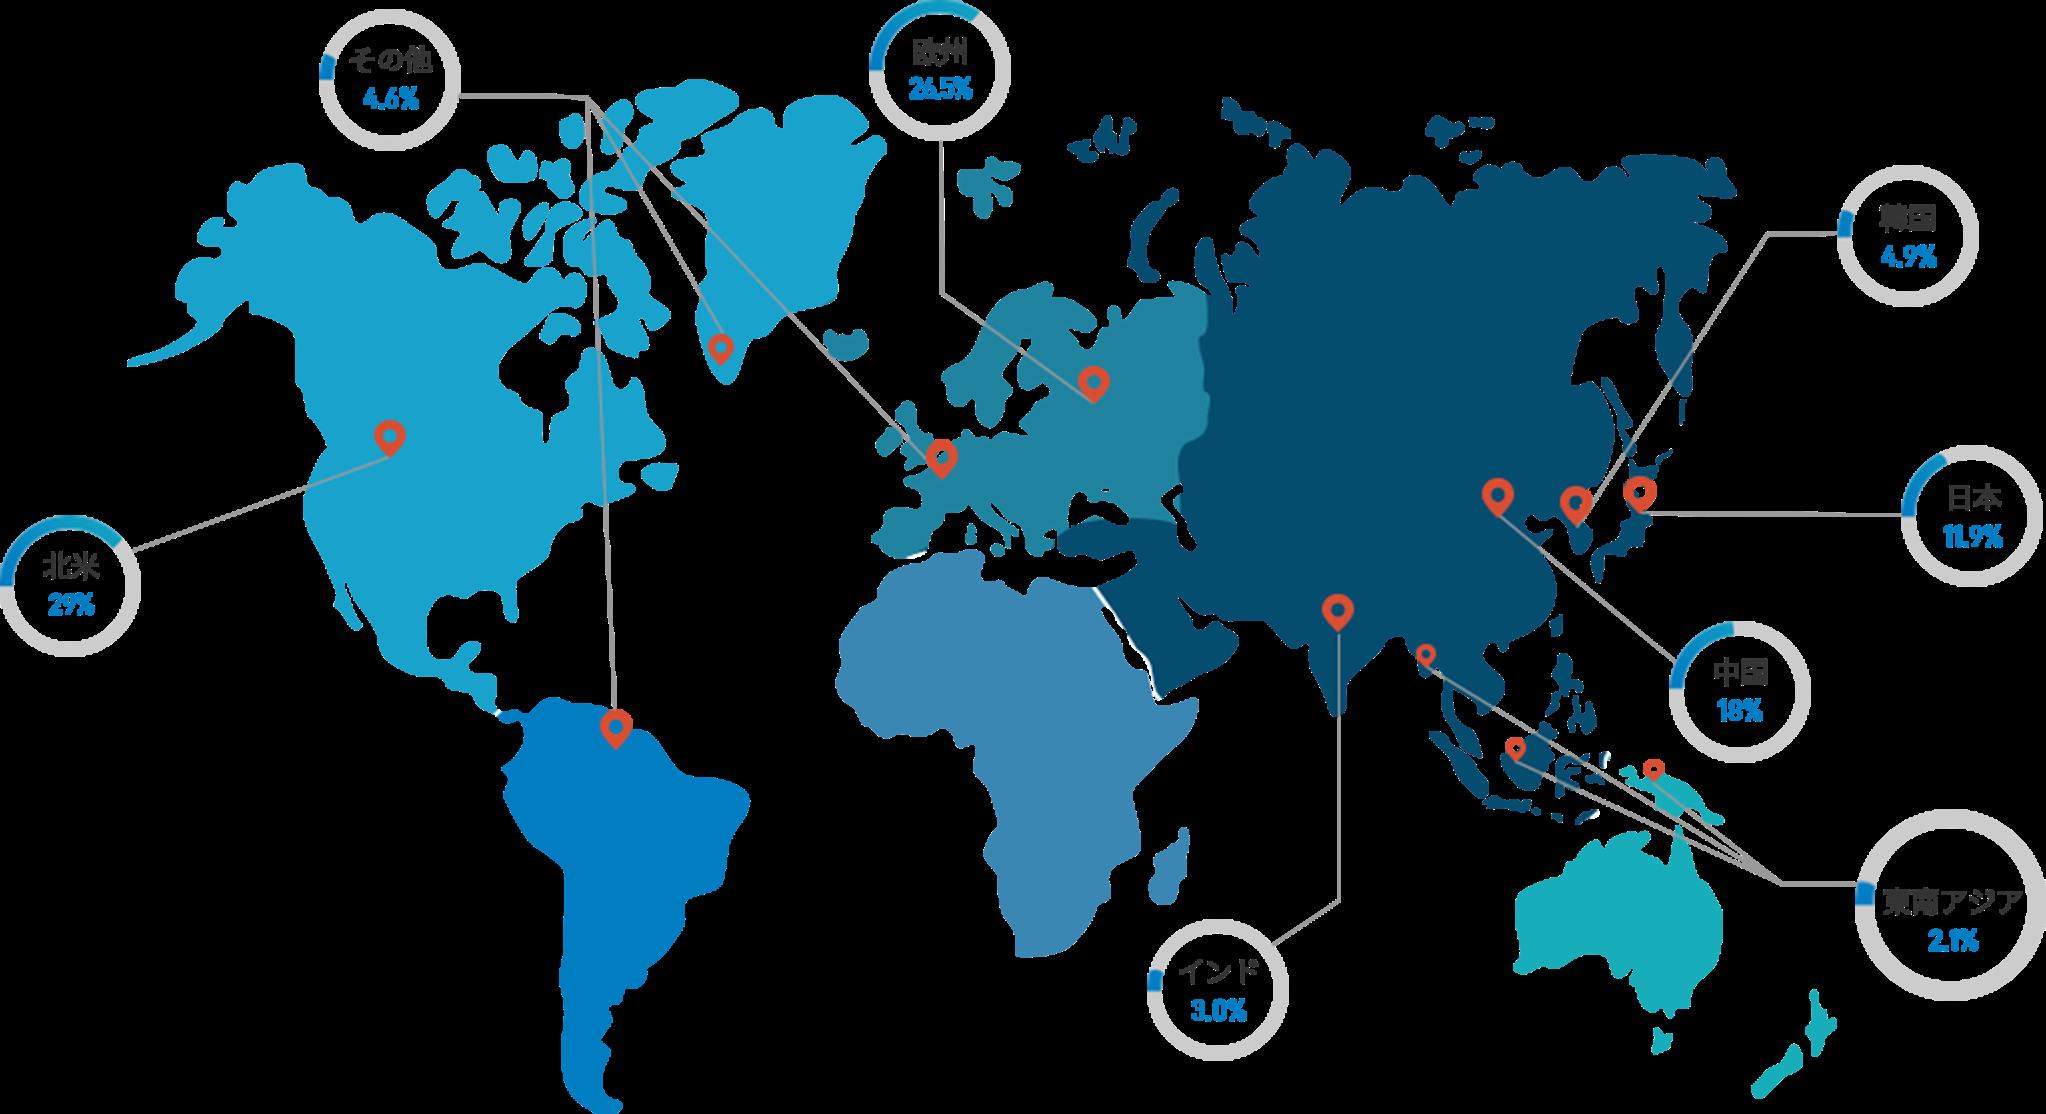 region-map.png (584 KB)